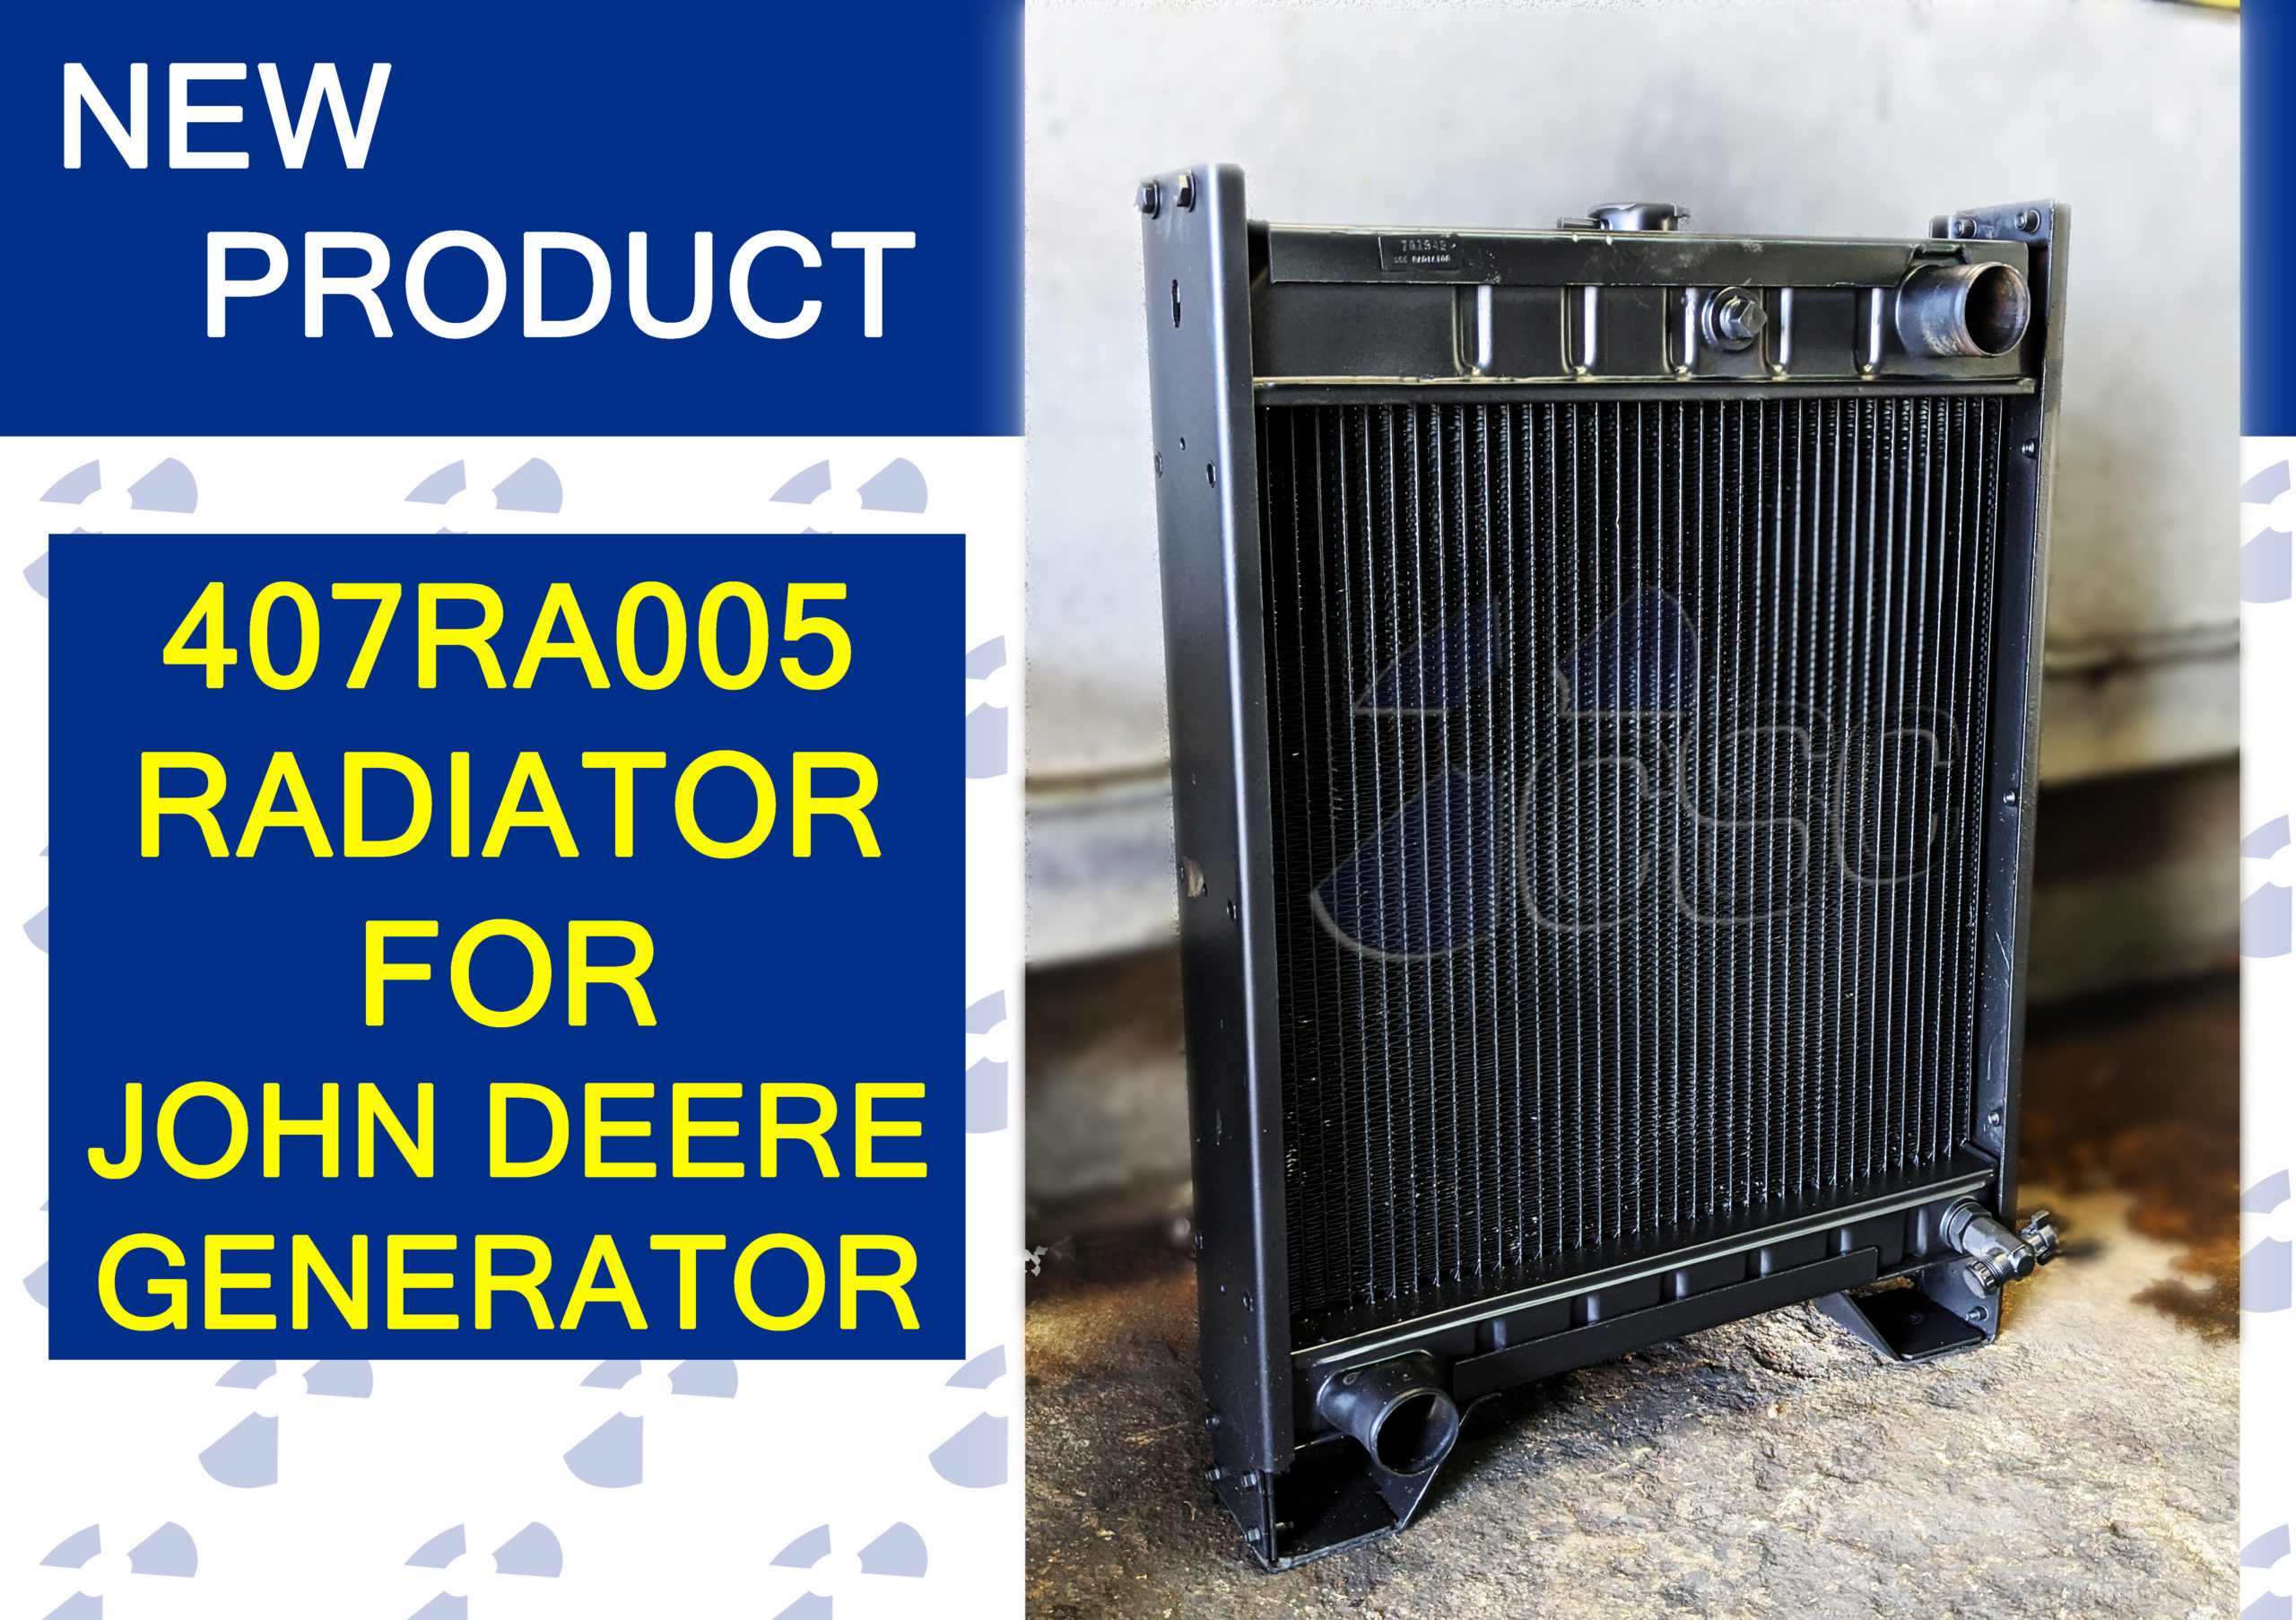 New 407RA005 Radiator for John Deere Generator